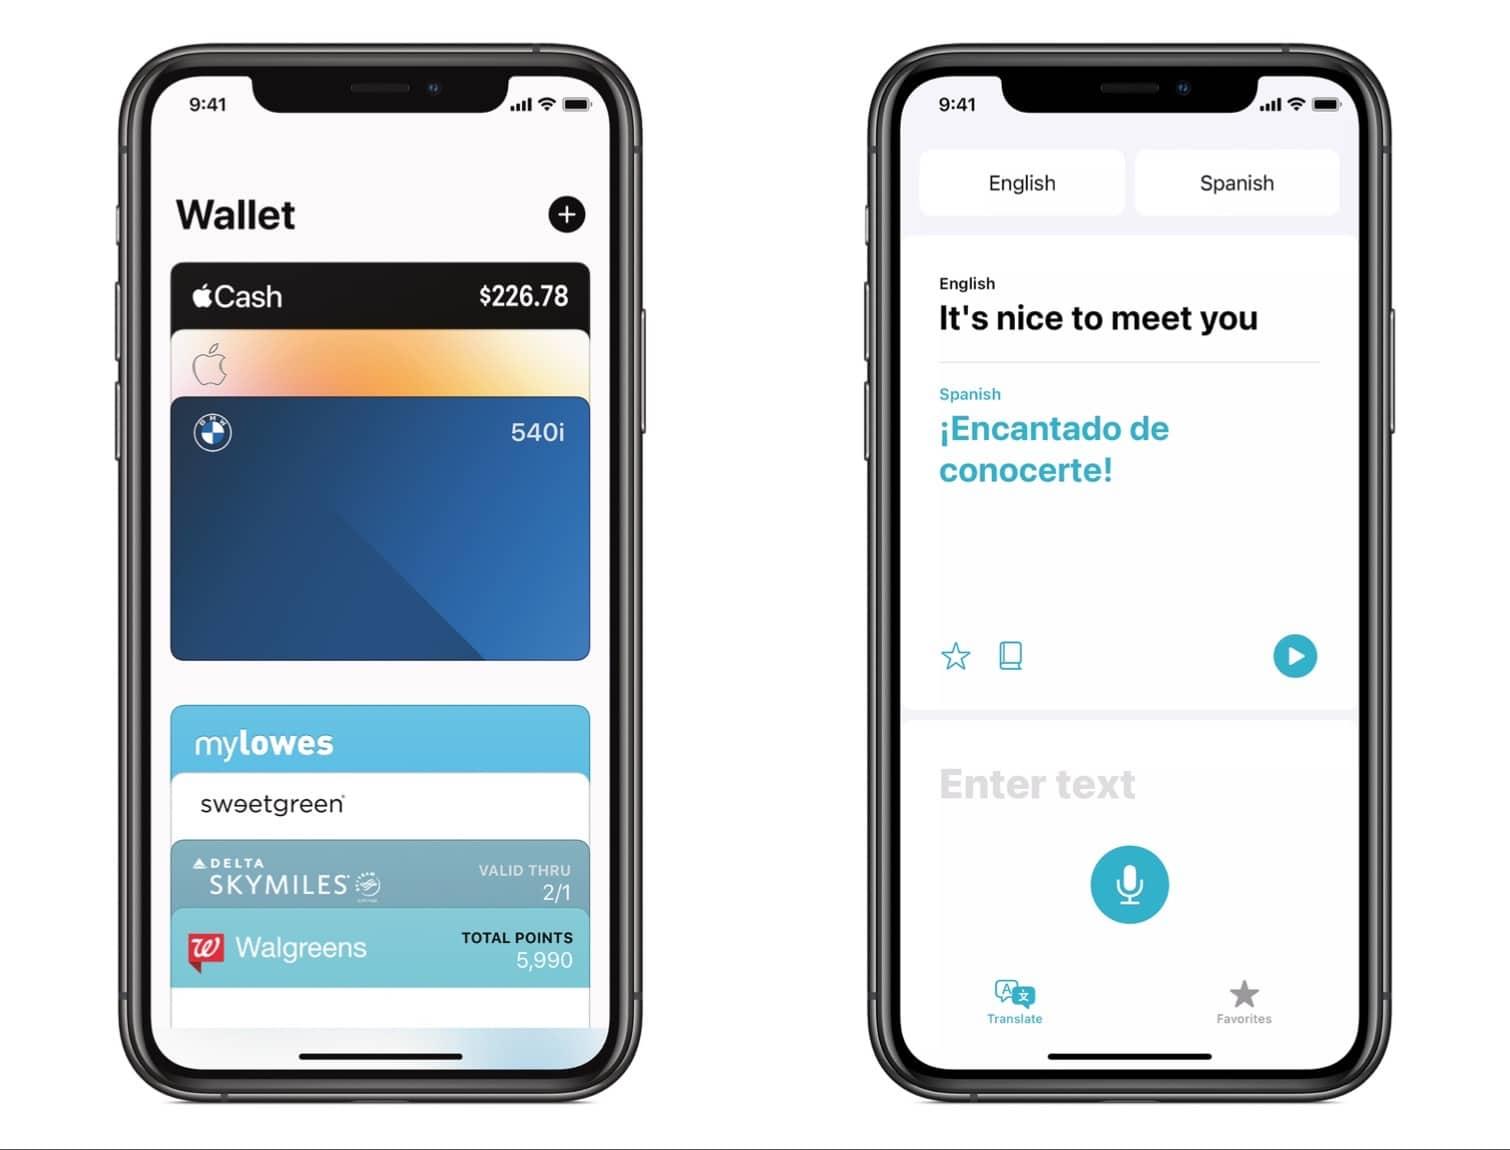 Digital car keys join the Wallet app (left), and Apple gains a translation app (right)